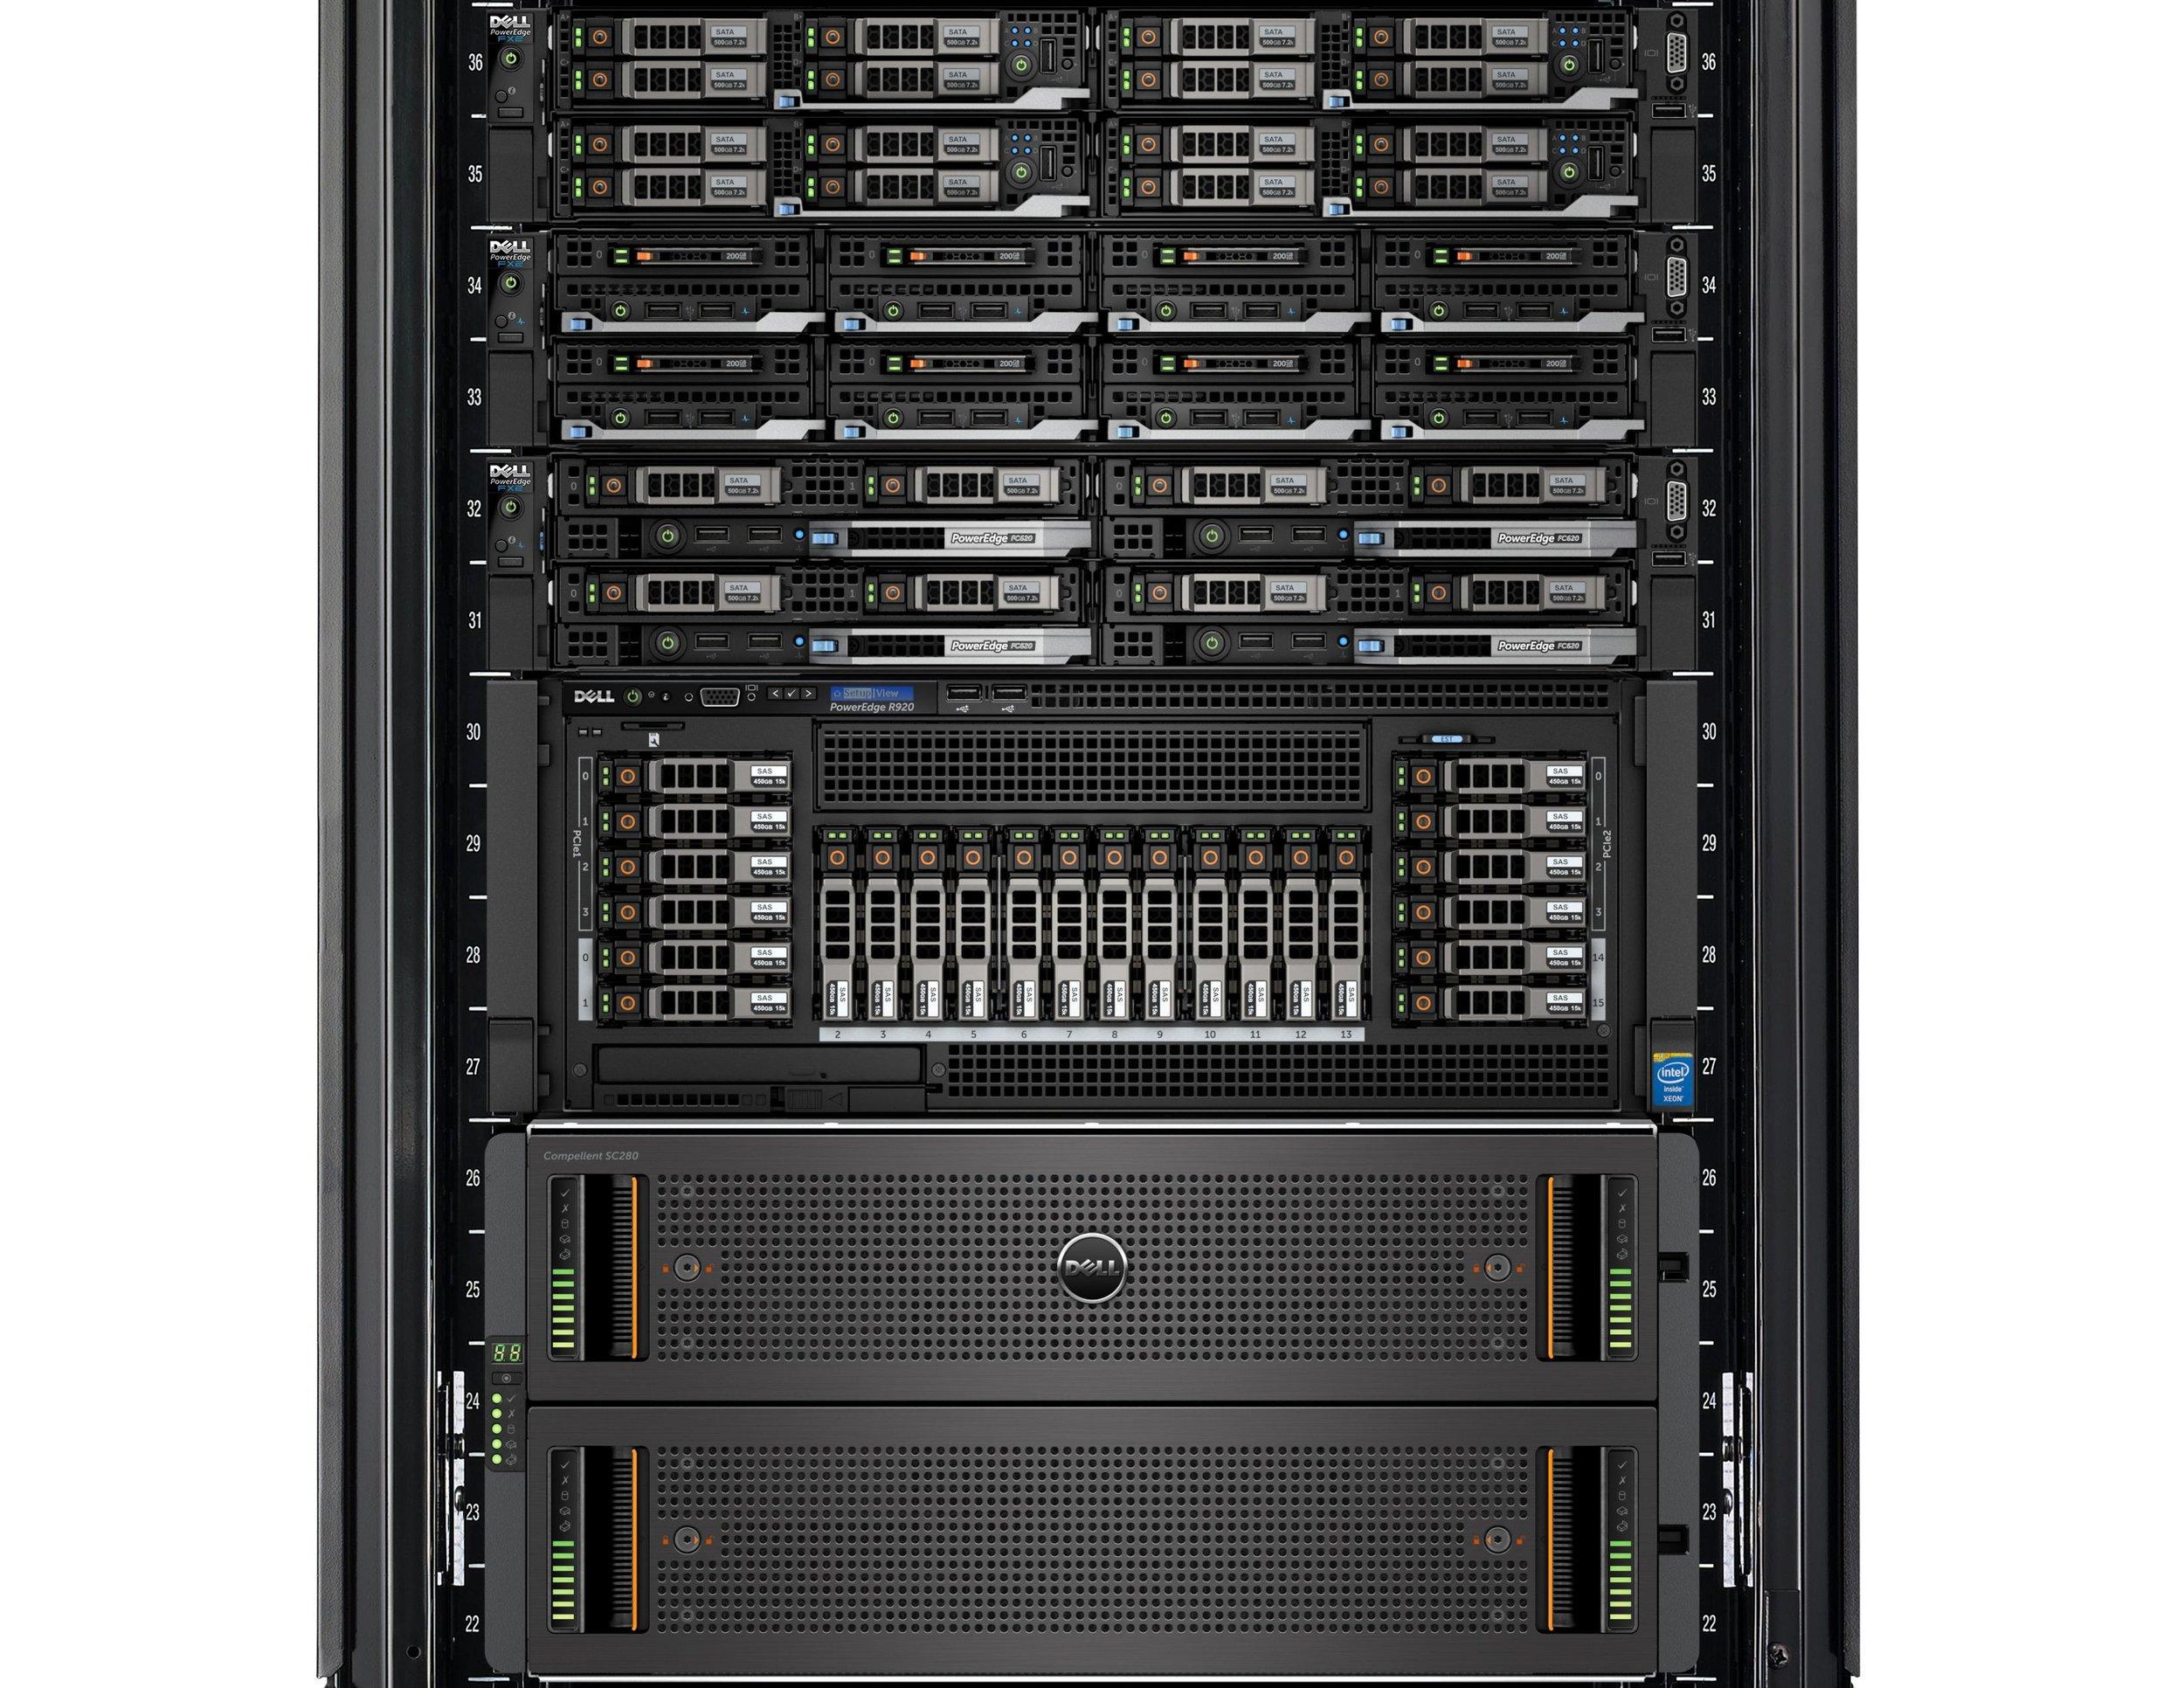 Dell Equipment Rental